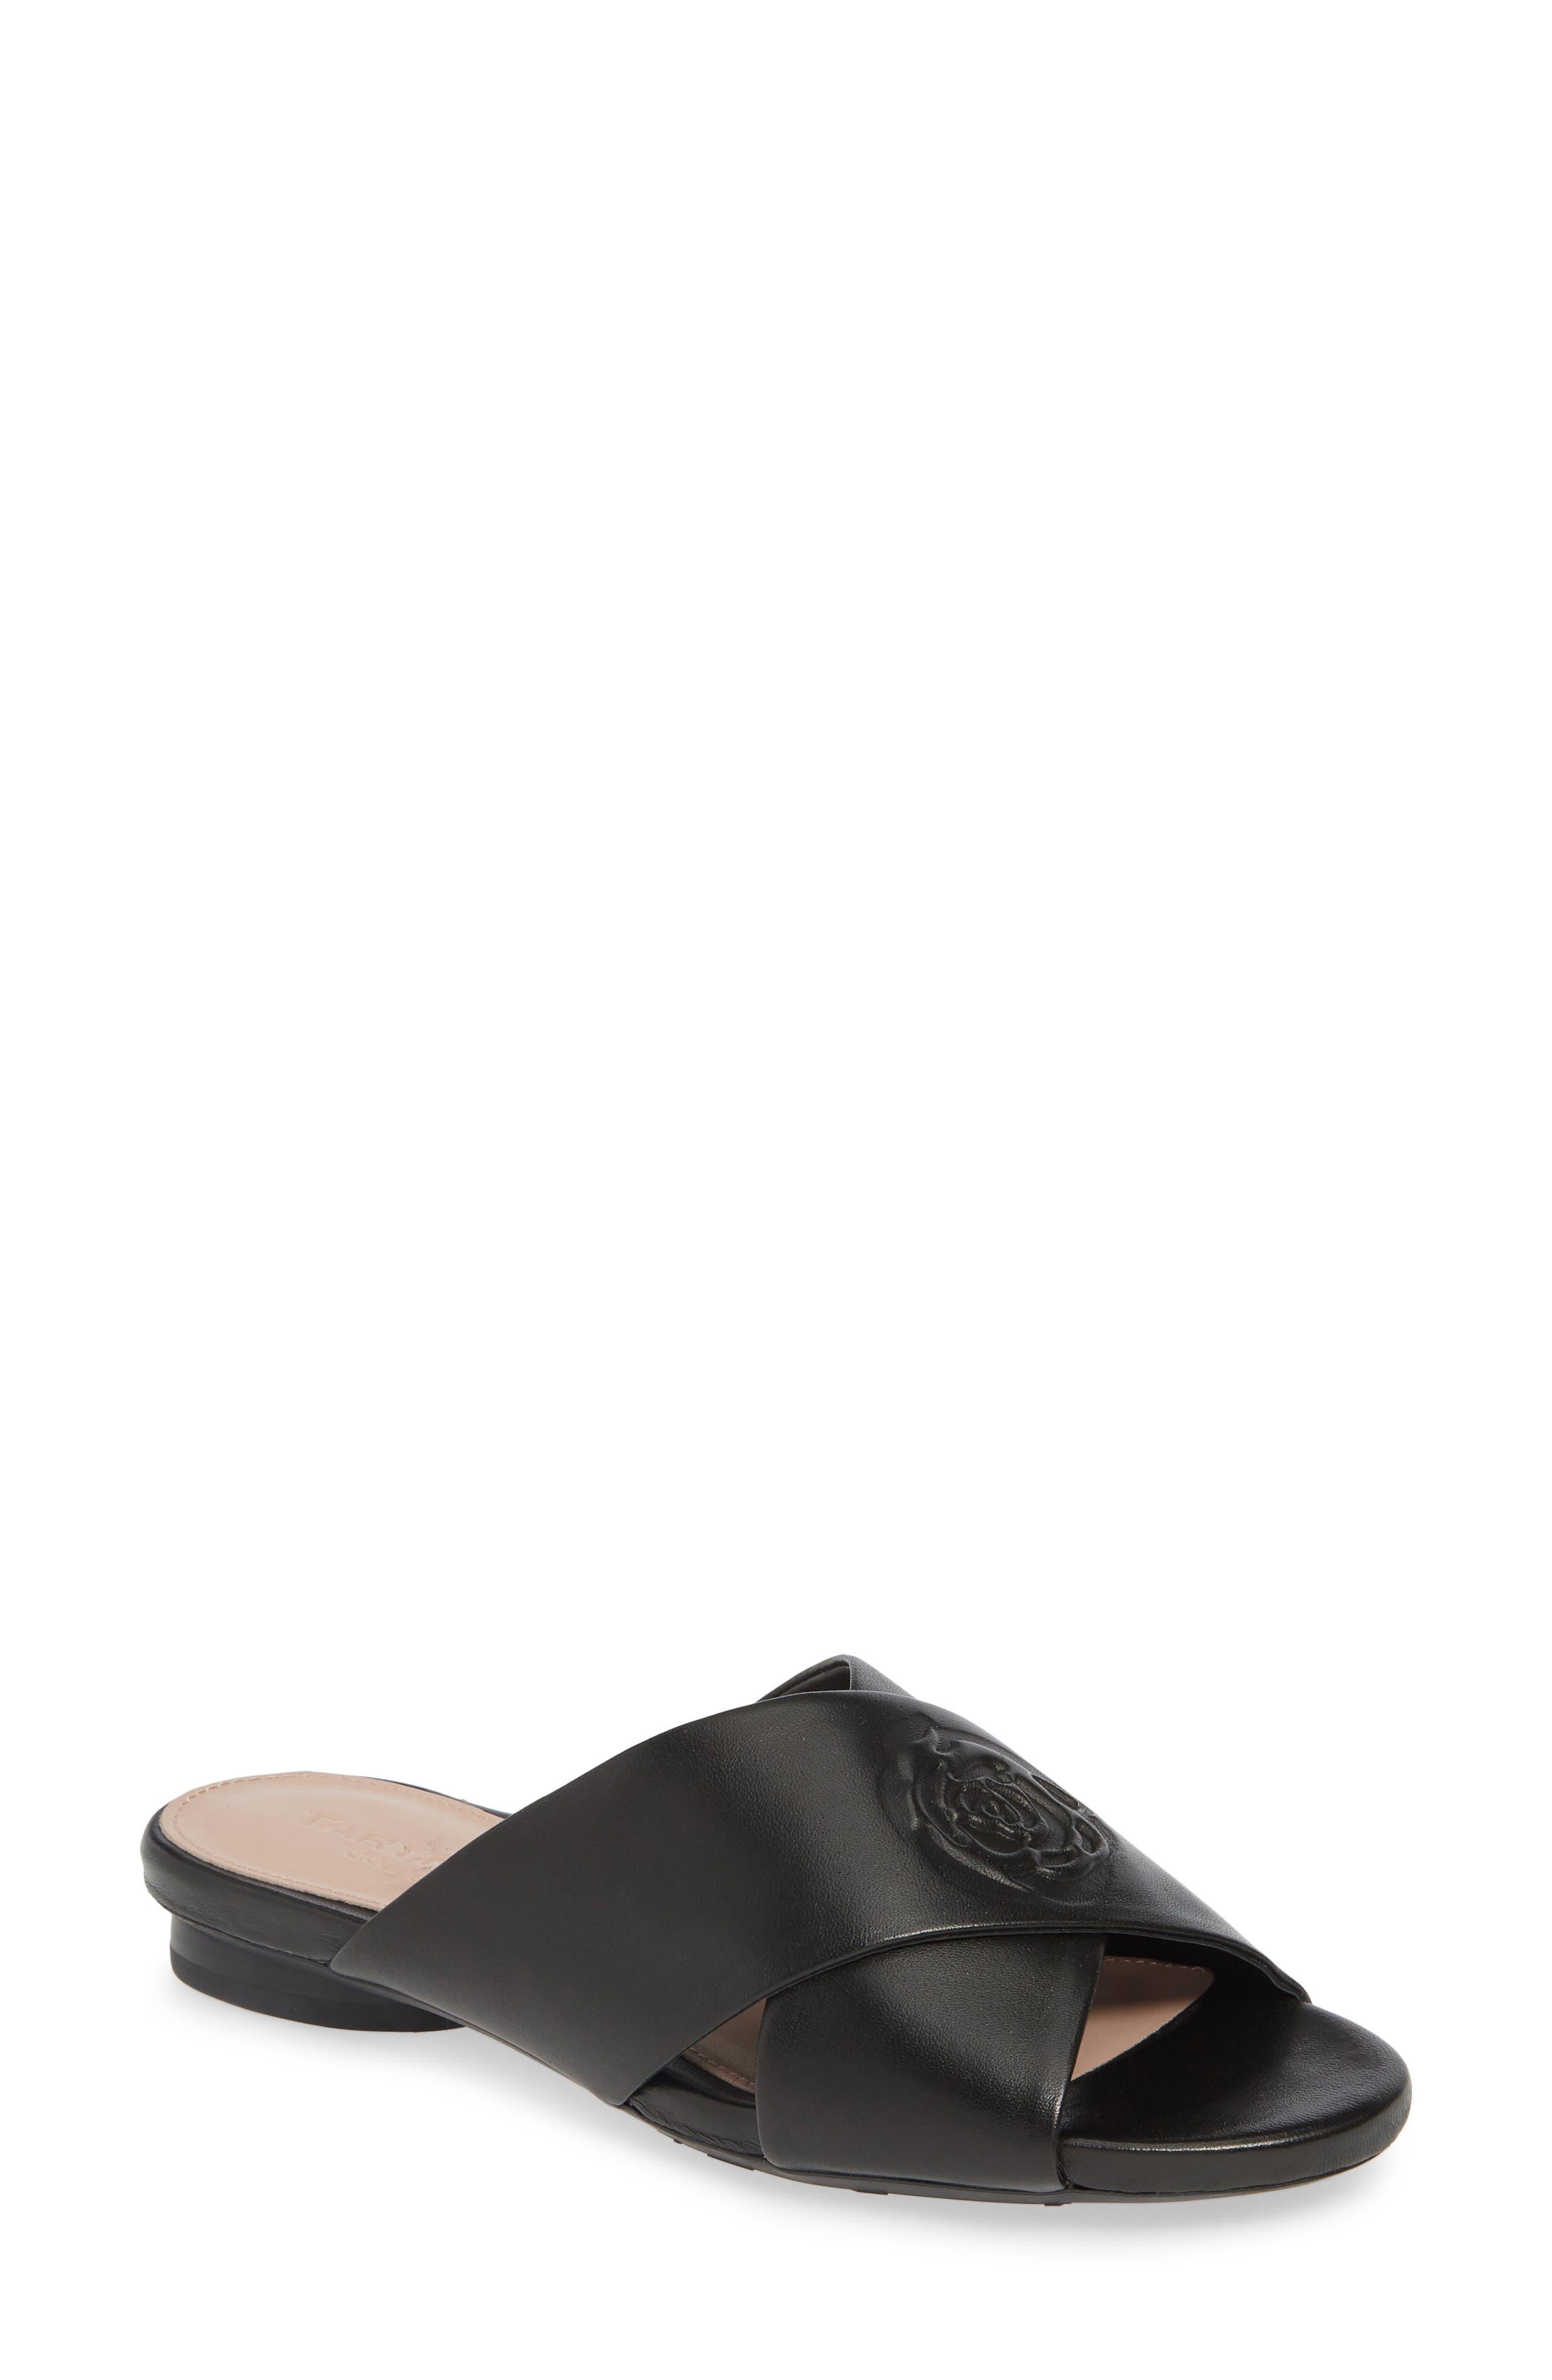 Taryn Rose Collection Leah Slide Sandal, Black